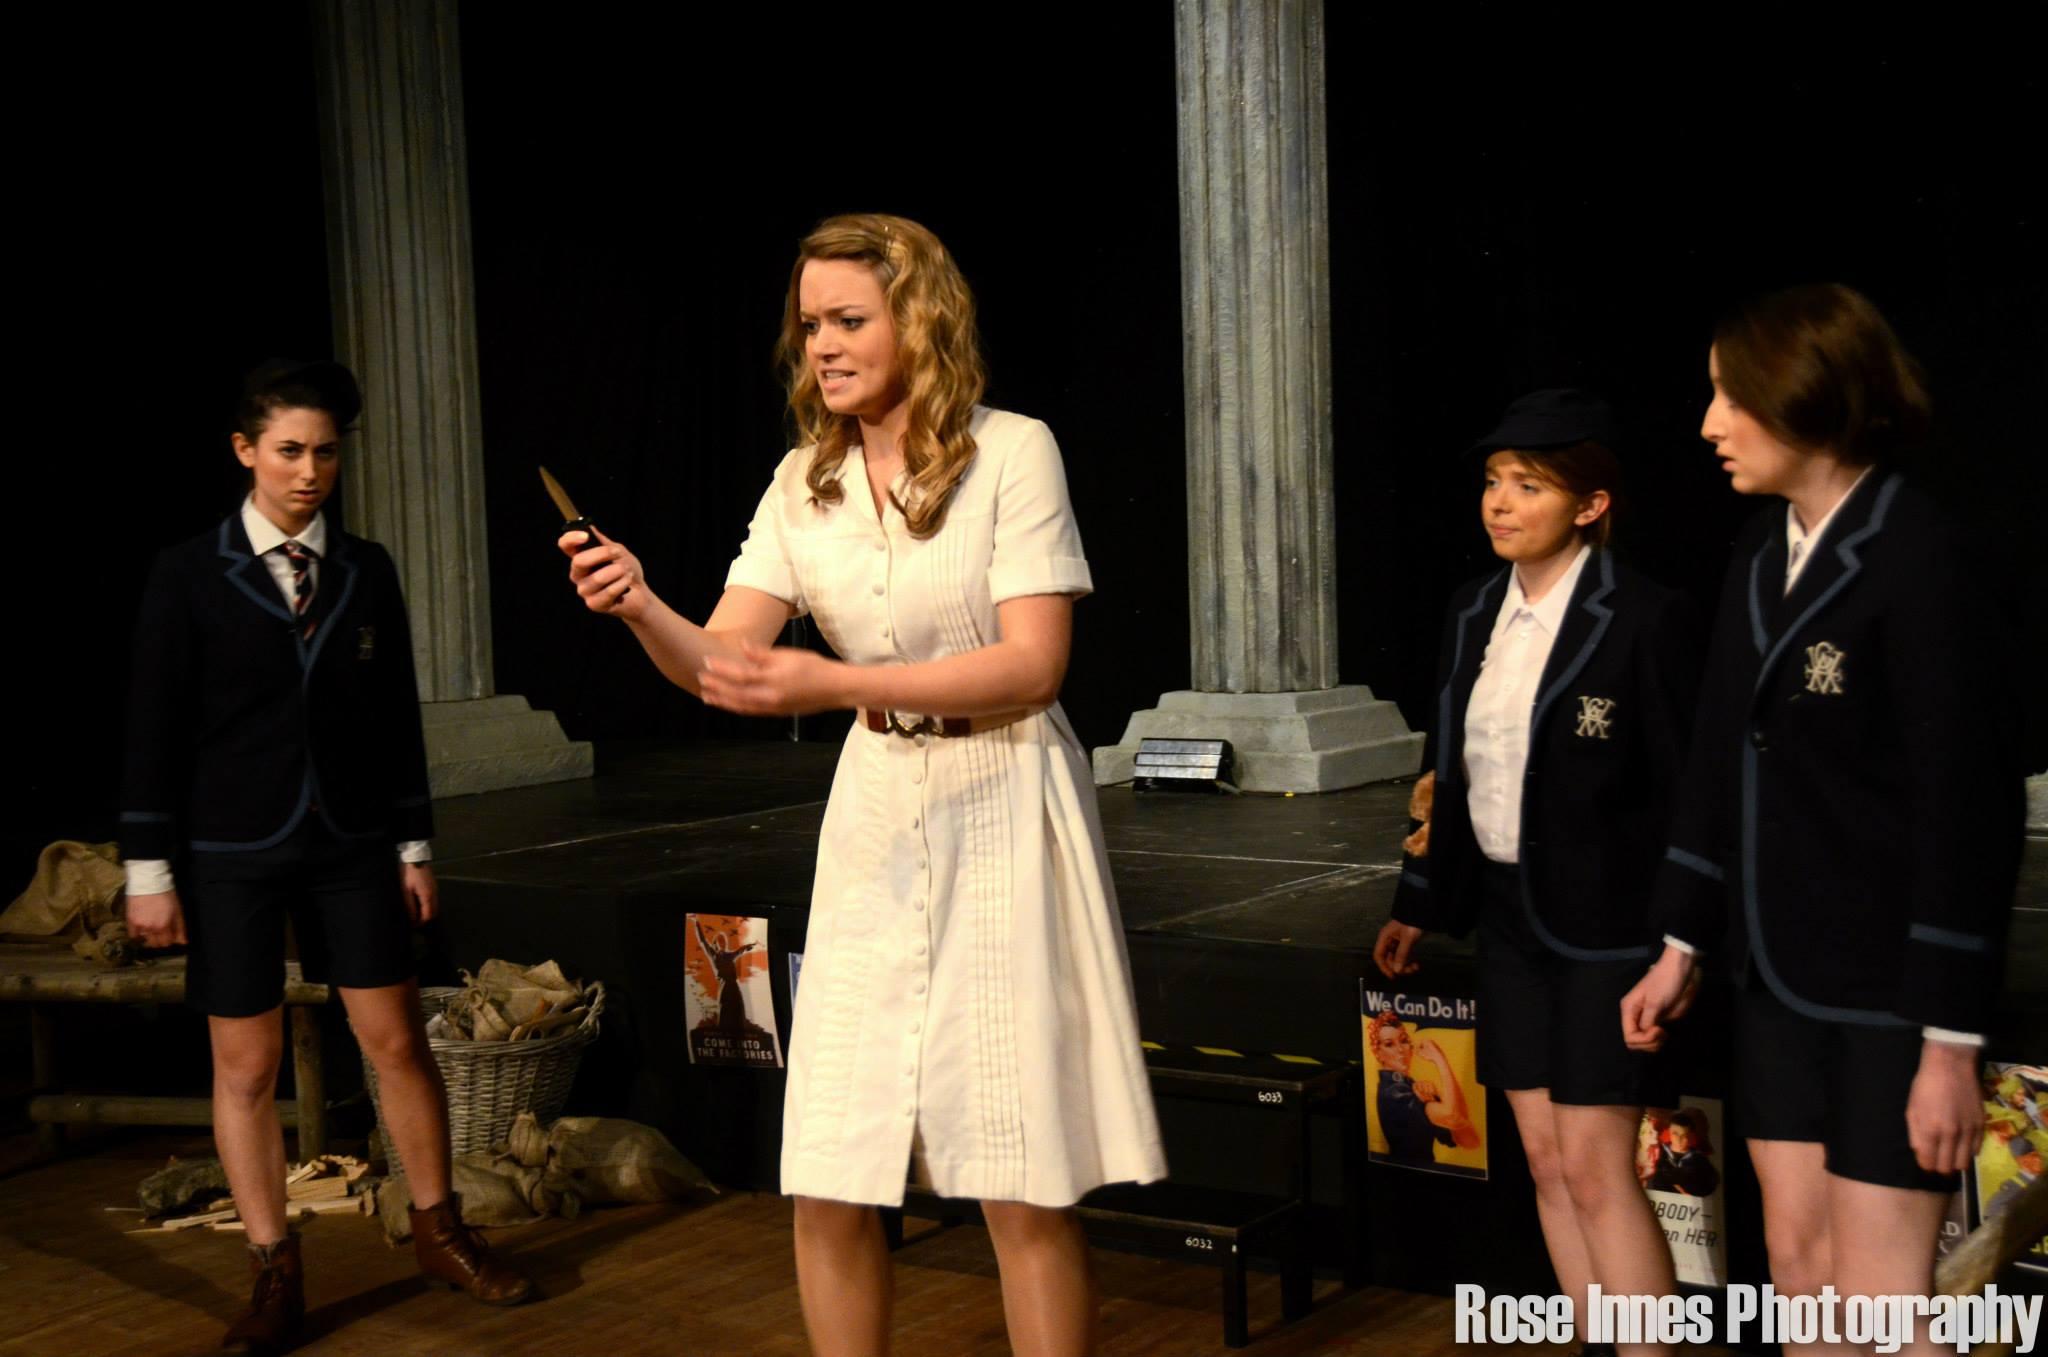 Camilla Harris Magic Flute 8 © Rose Innes Photography